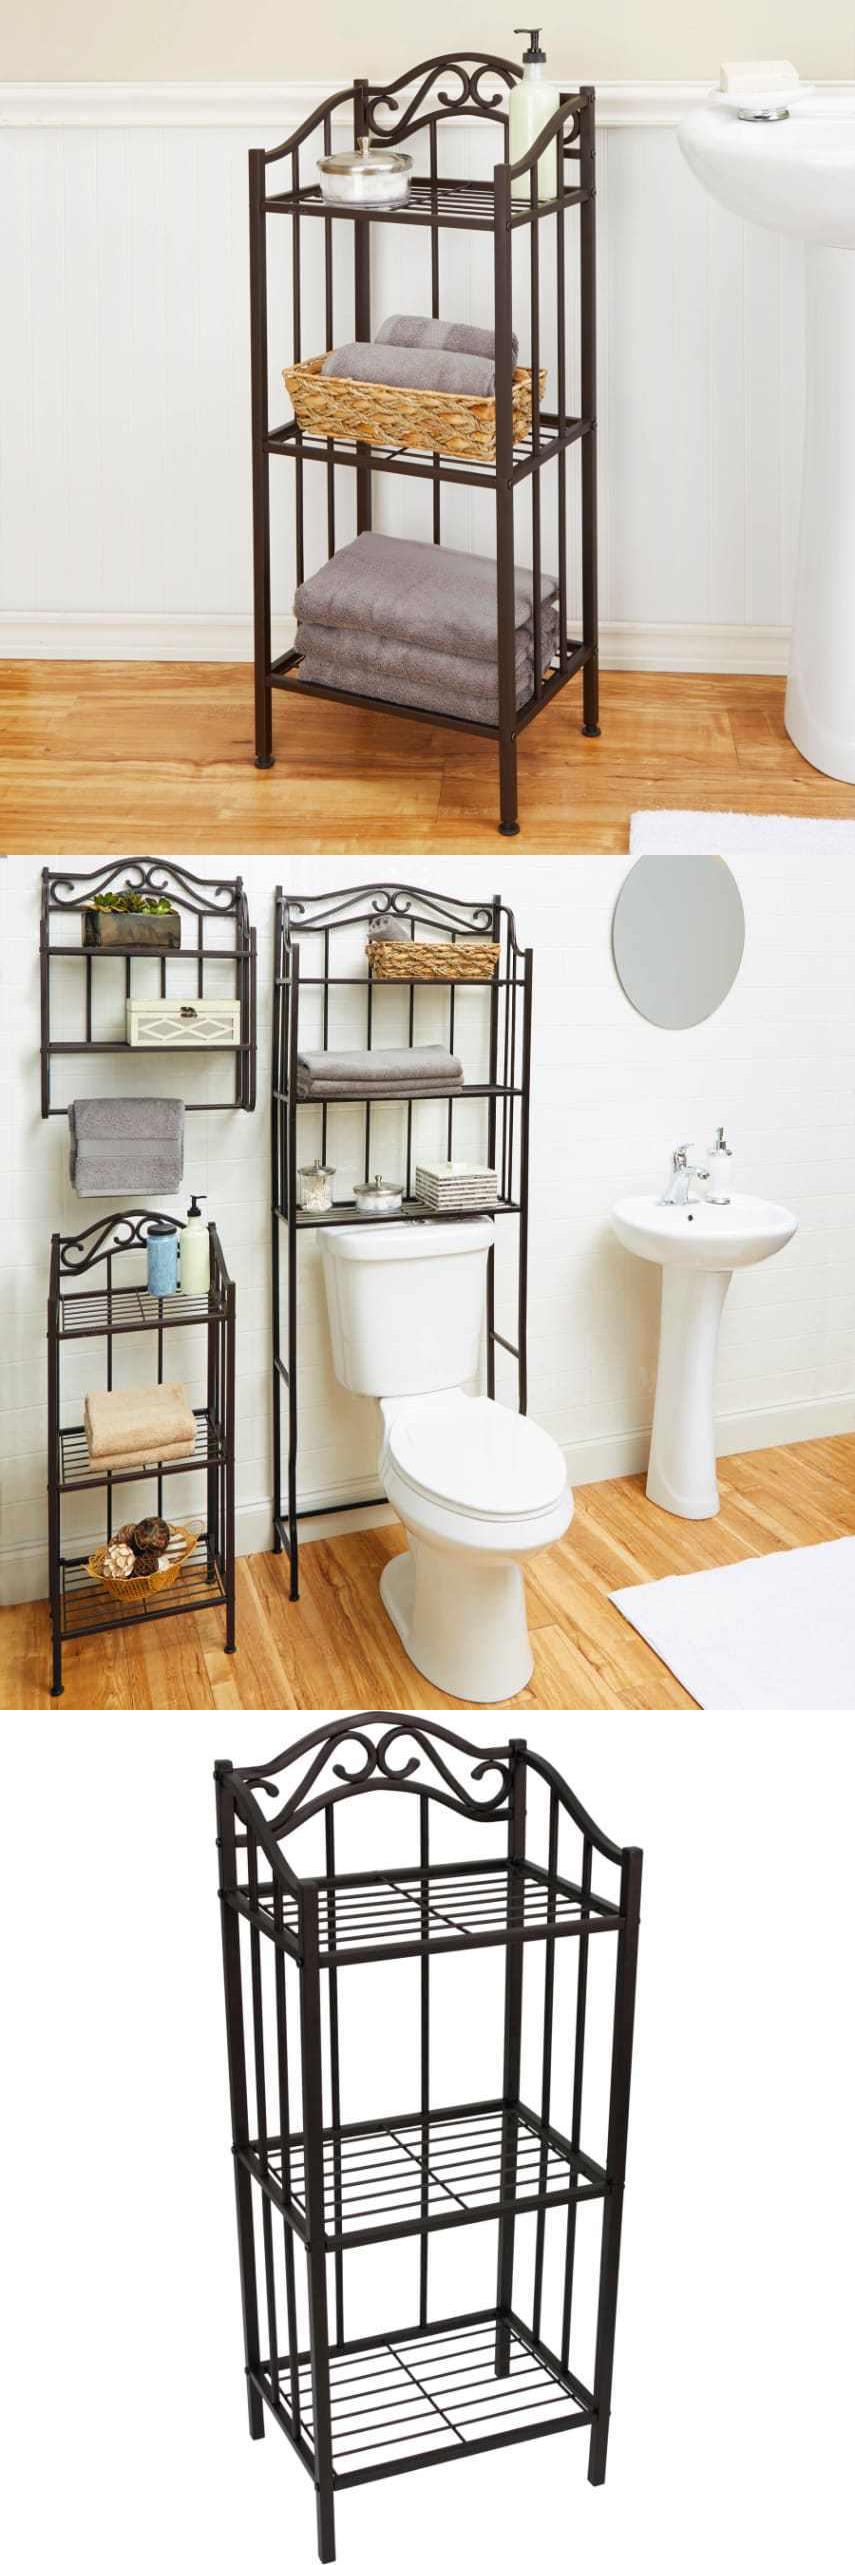 Bathroom floor caddy - Bath Caddies And Storage 54075 Bathroom Floor Cabinet Storage Shelf Shelves Furniture Organizer Chapter Bronze